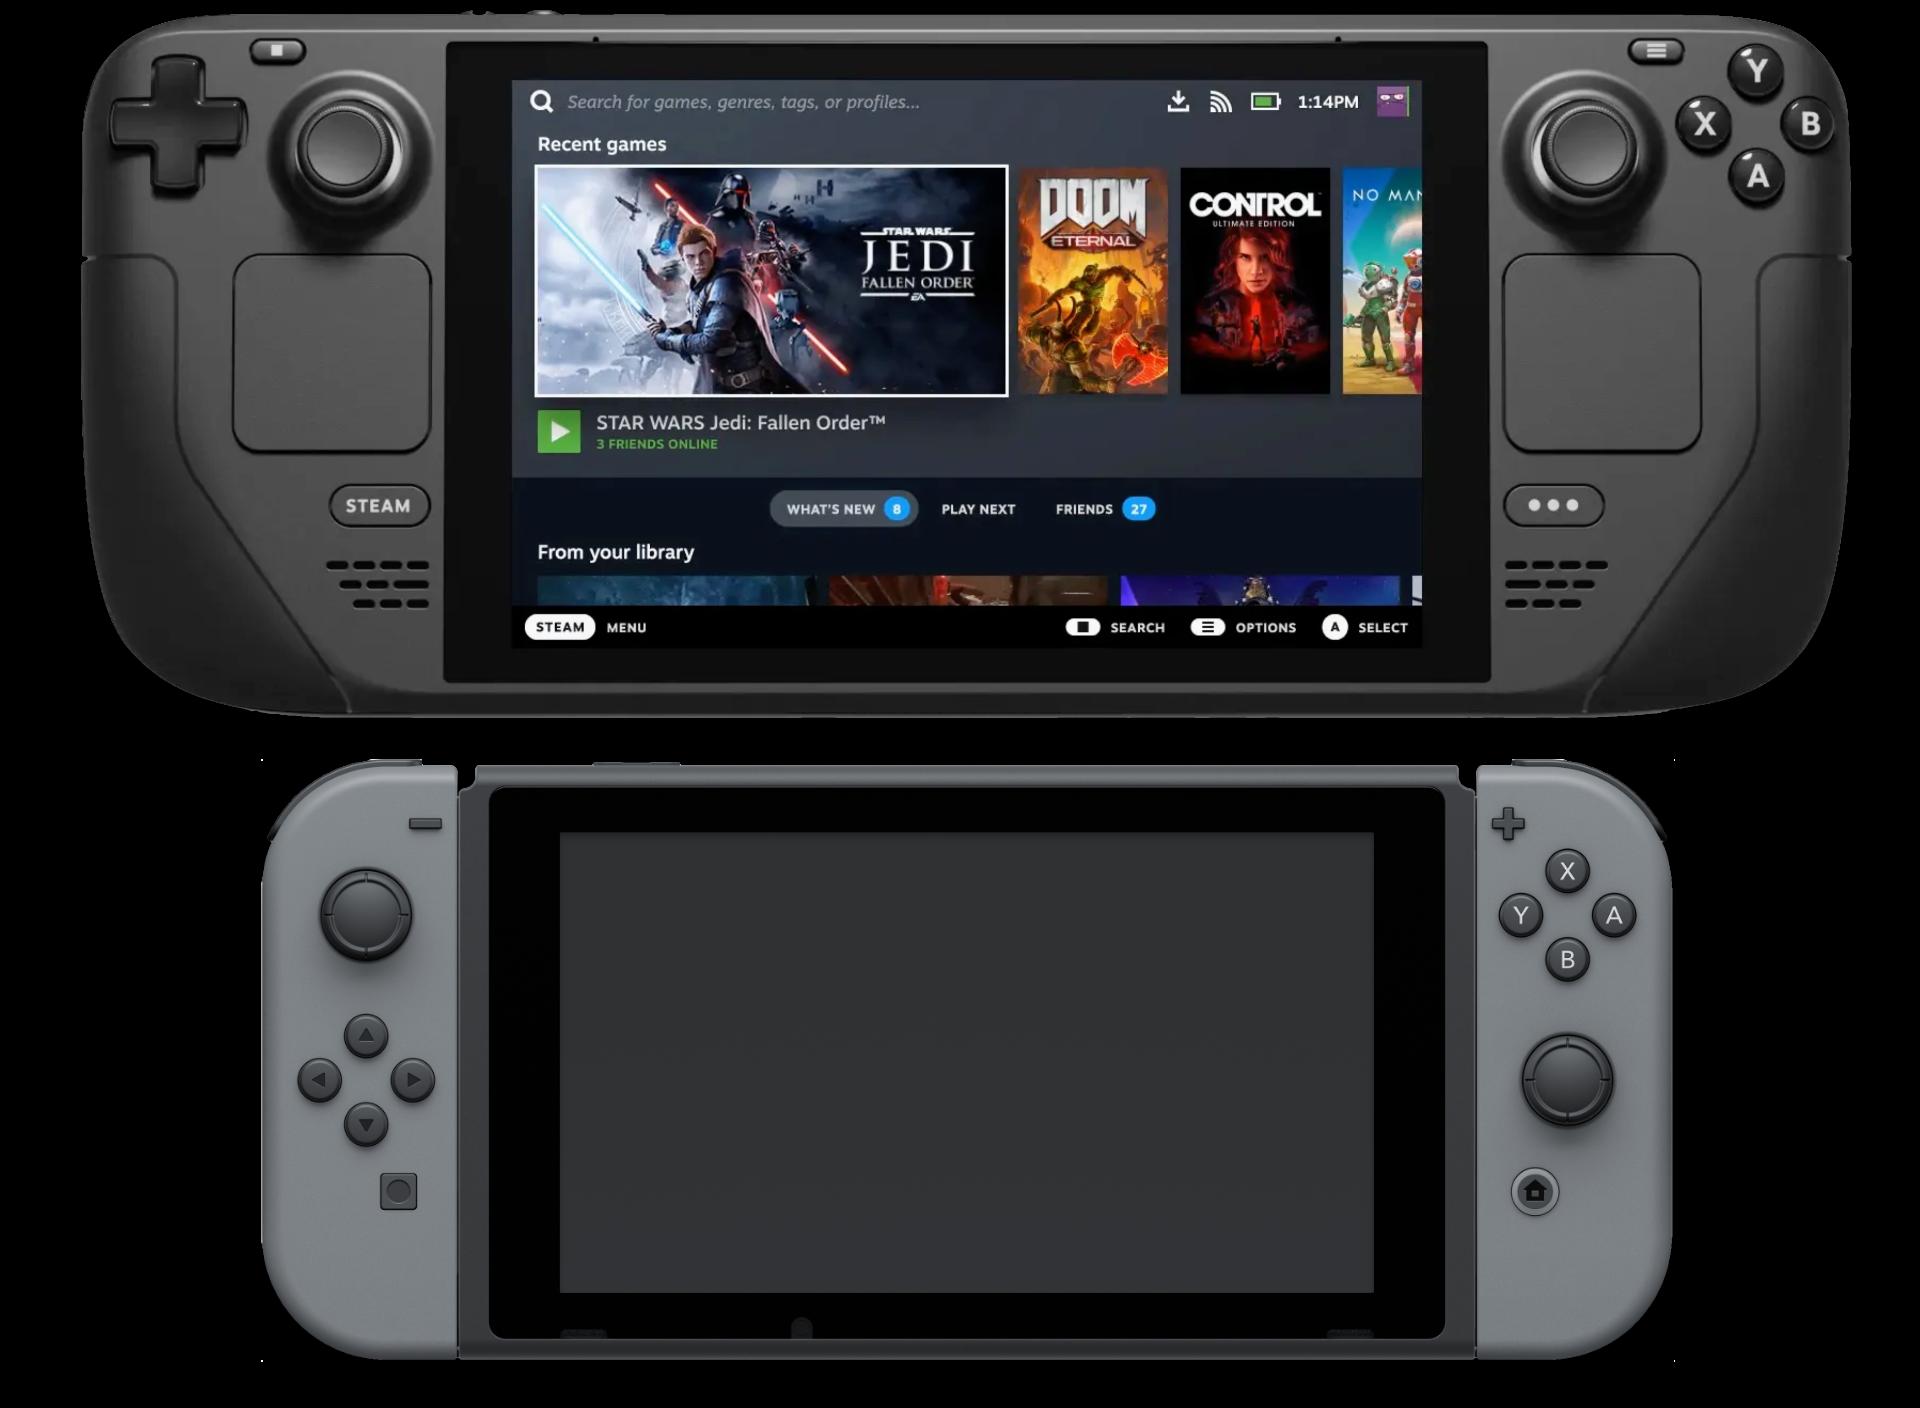 Steam Deck 29,8 cm vs. Nintendo Switch 23,9 cm